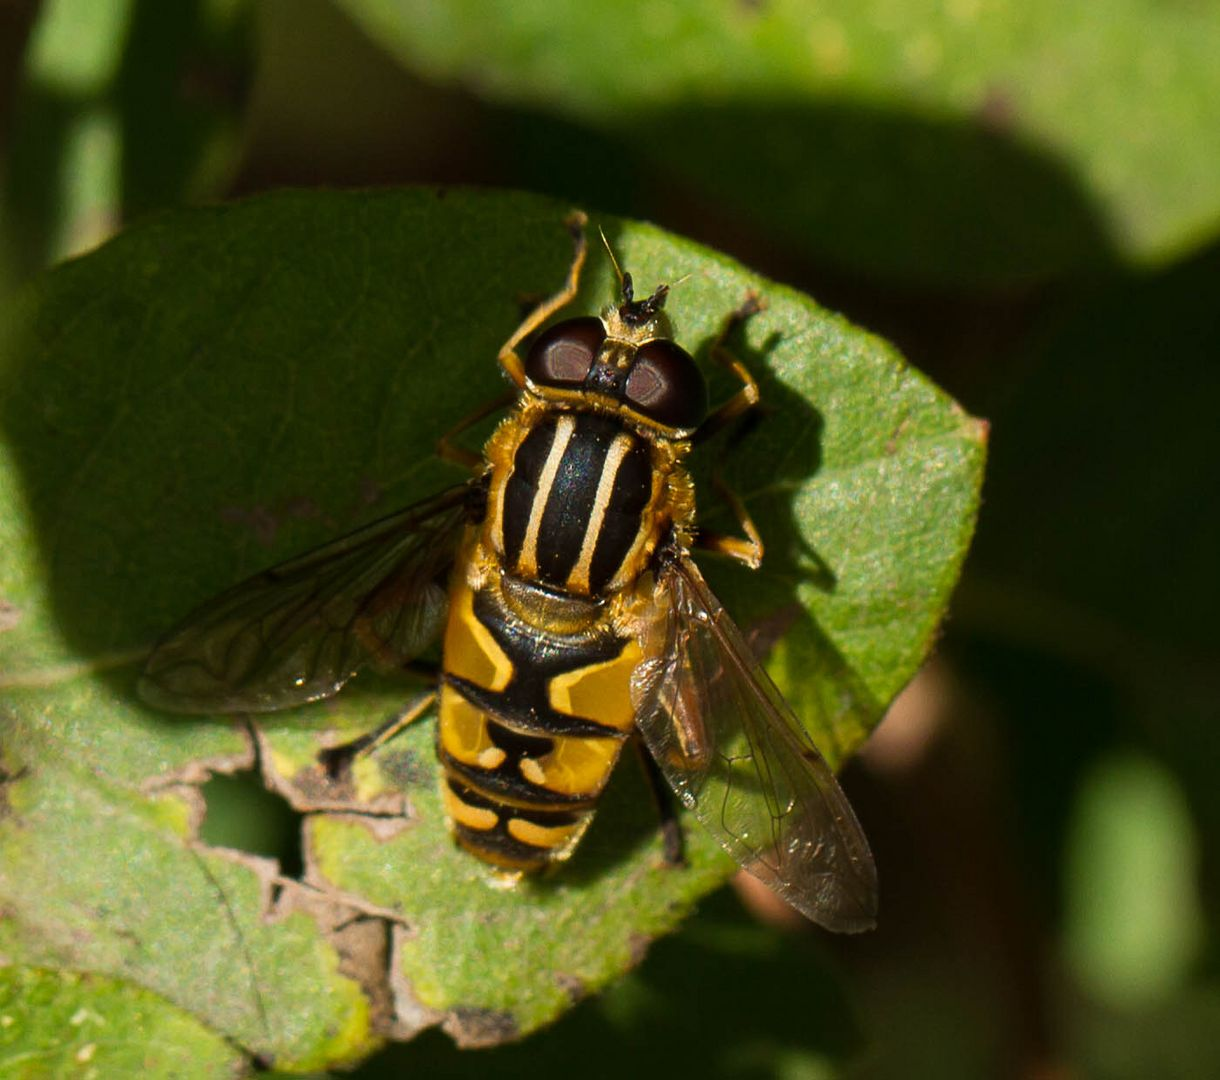 Wespe-Fliege-Biene?